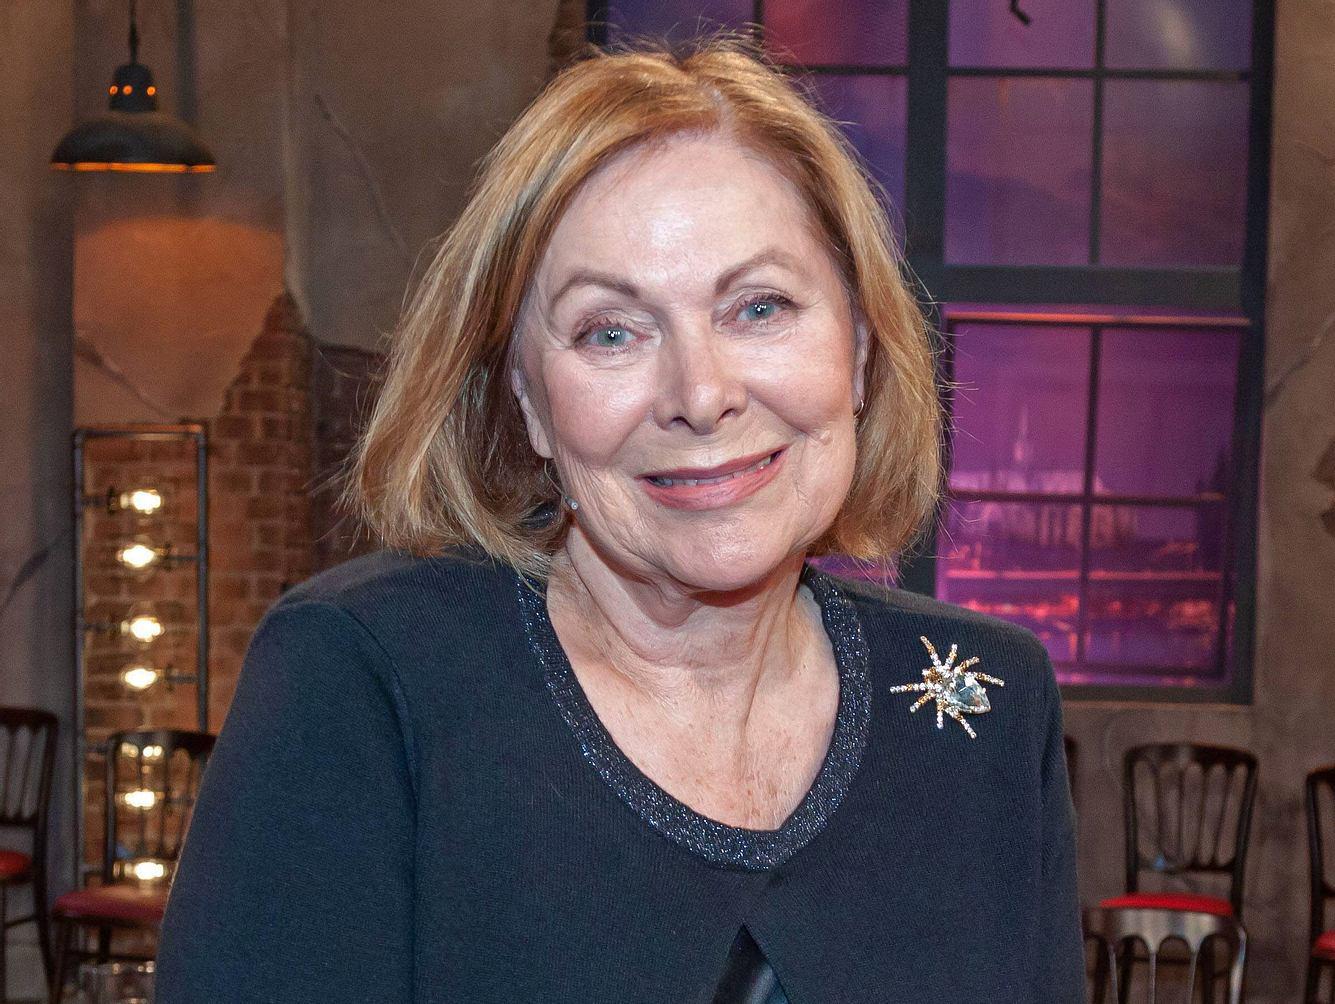 Heide Keller 2018 in der WDR-Talkshow 'Kölner Treff'.